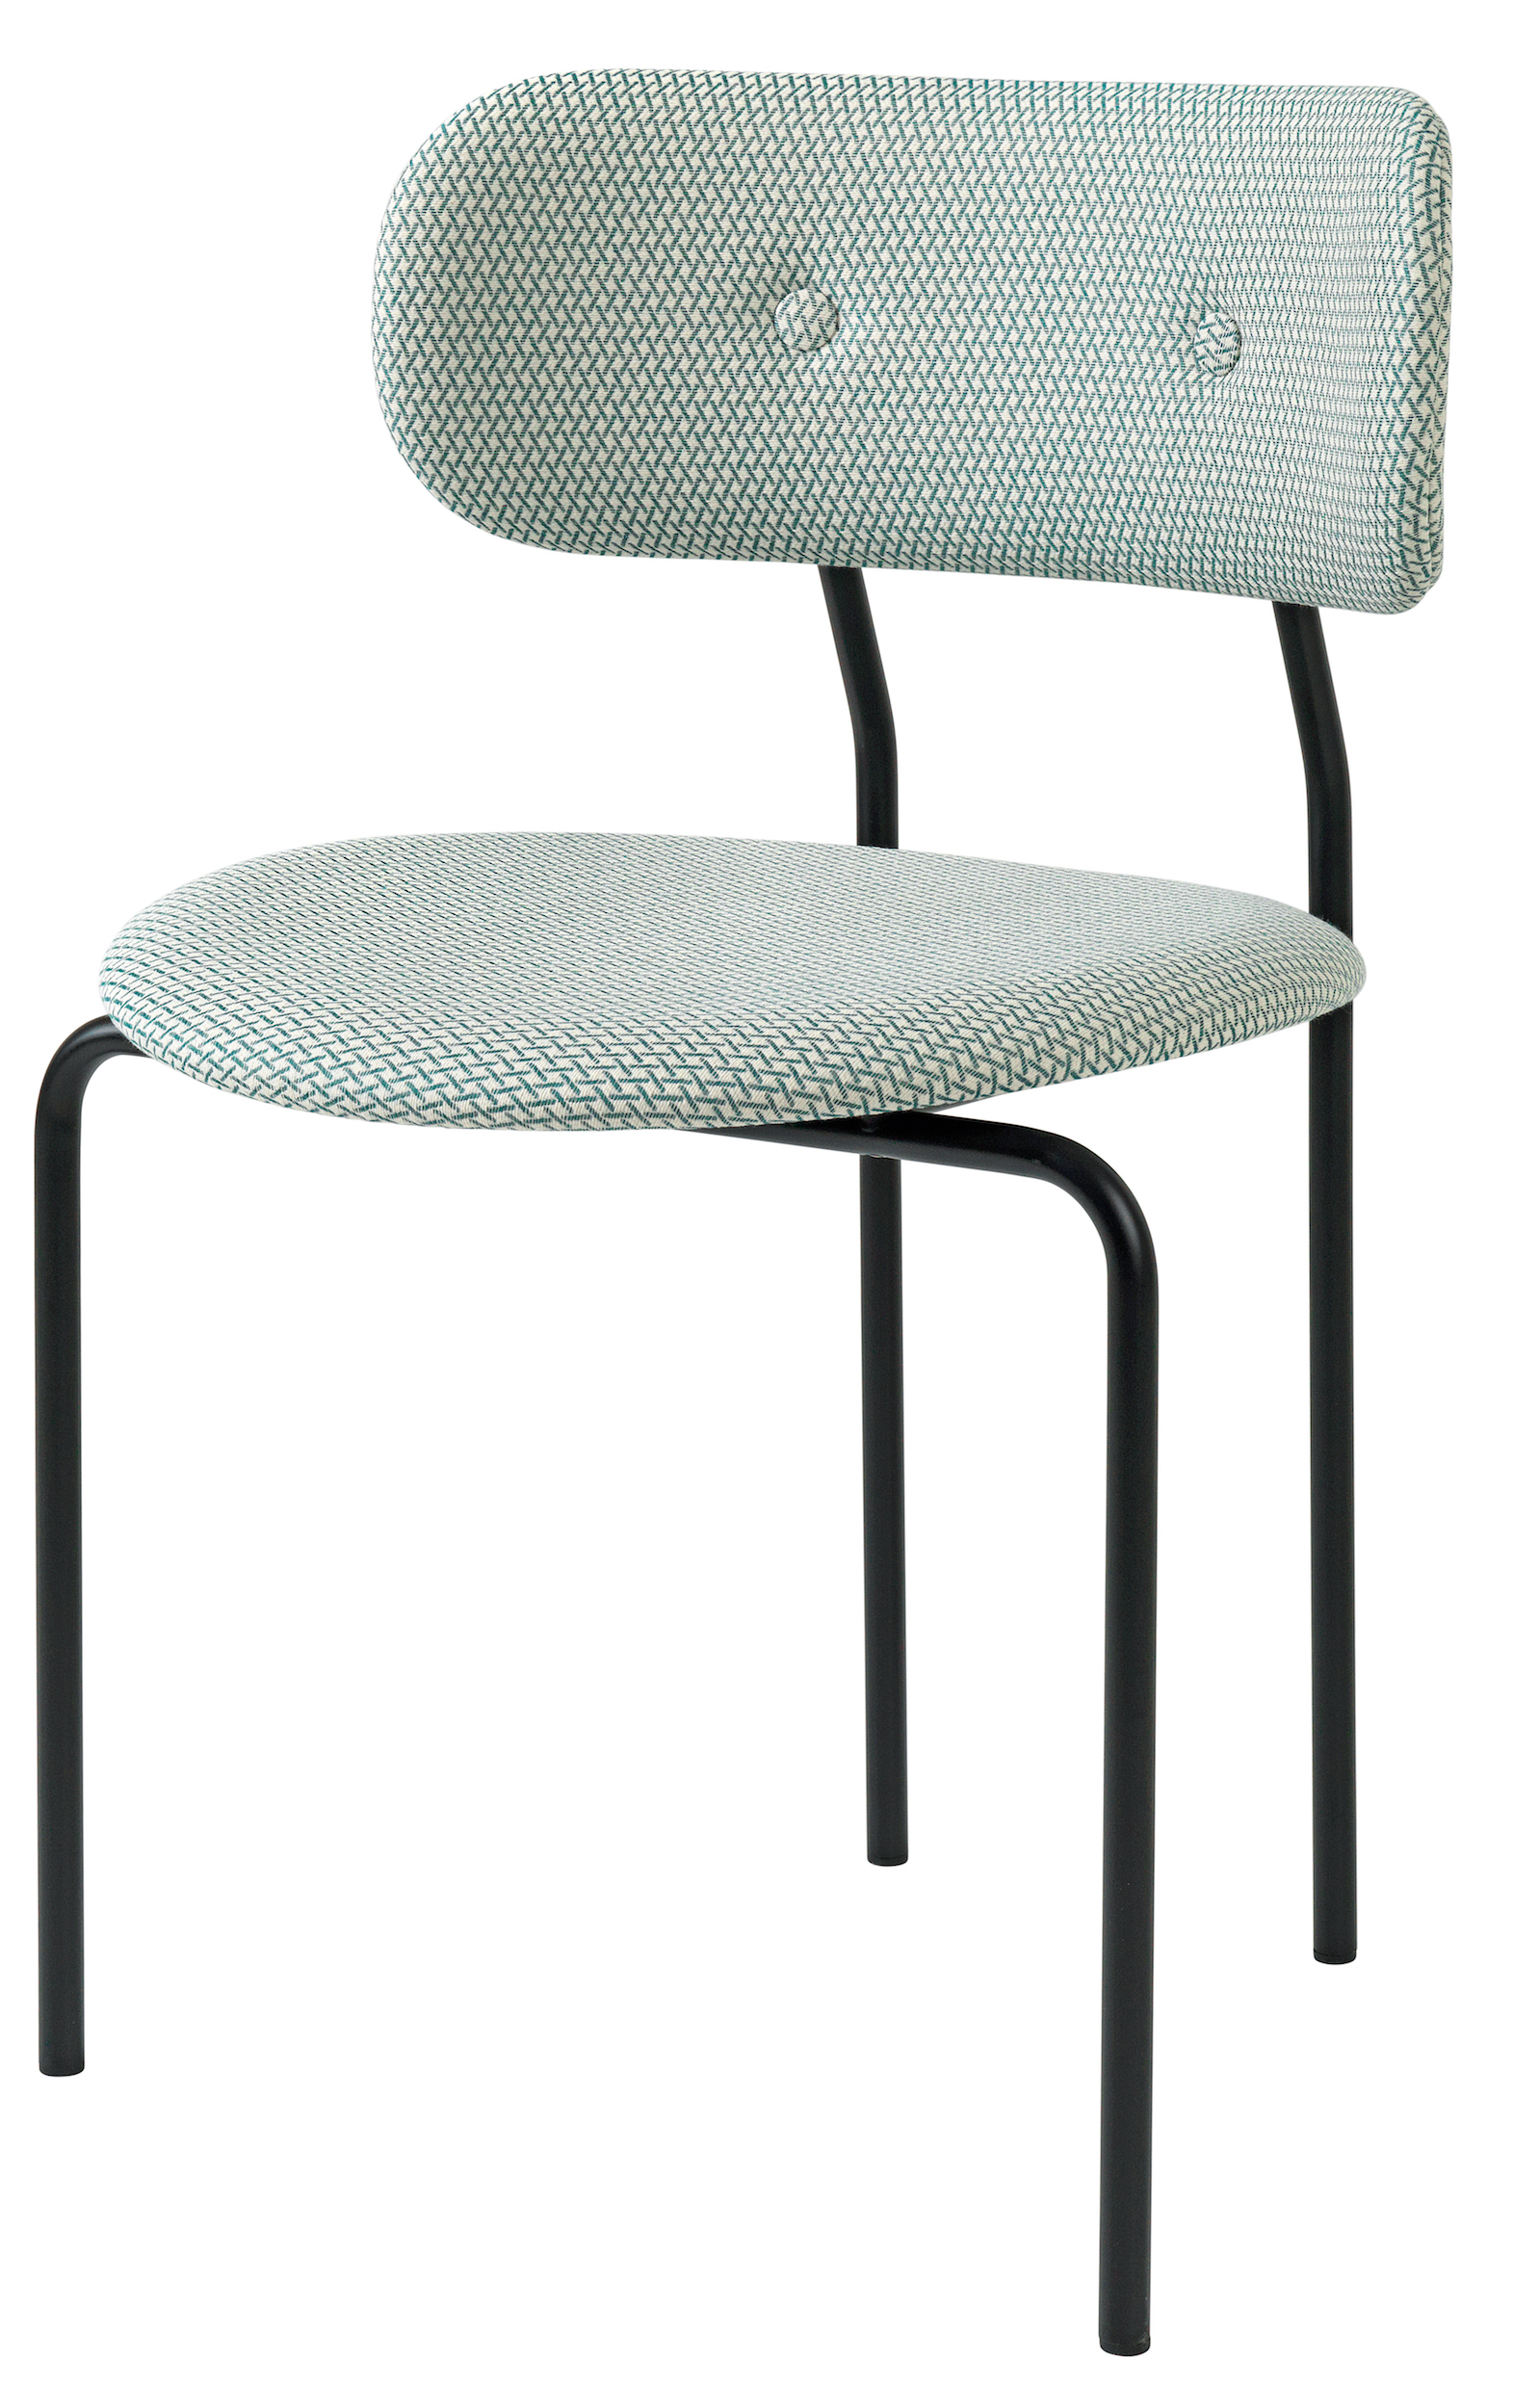 Gubi coco chair design oeo studio 2016 for Scandic design